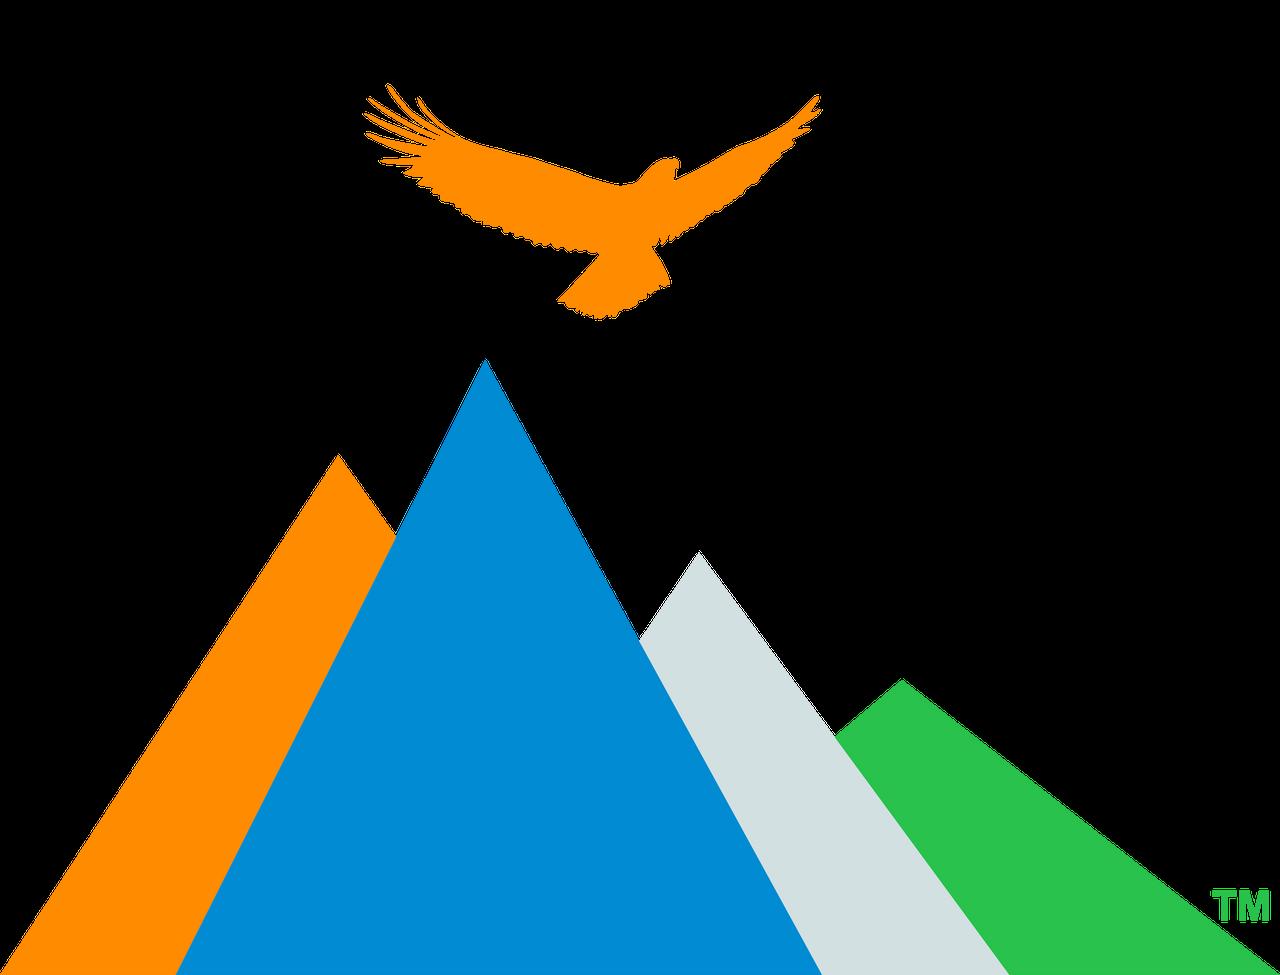 Freedom Focused logo